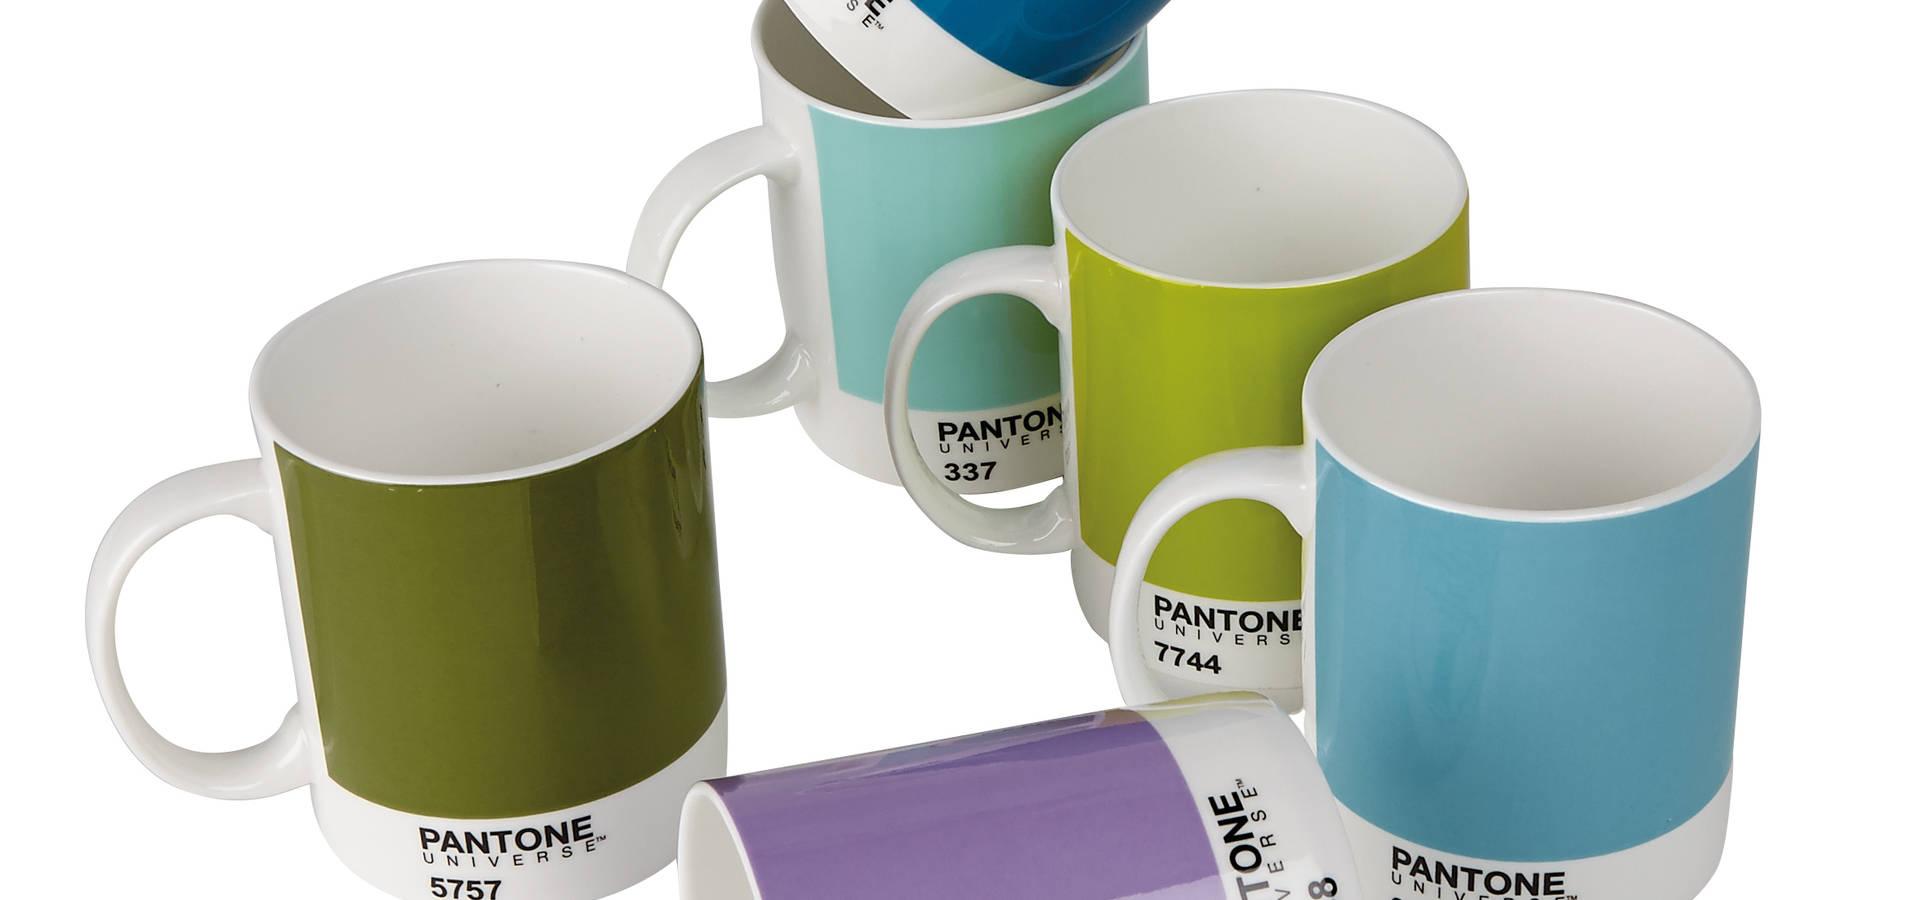 designed in colour